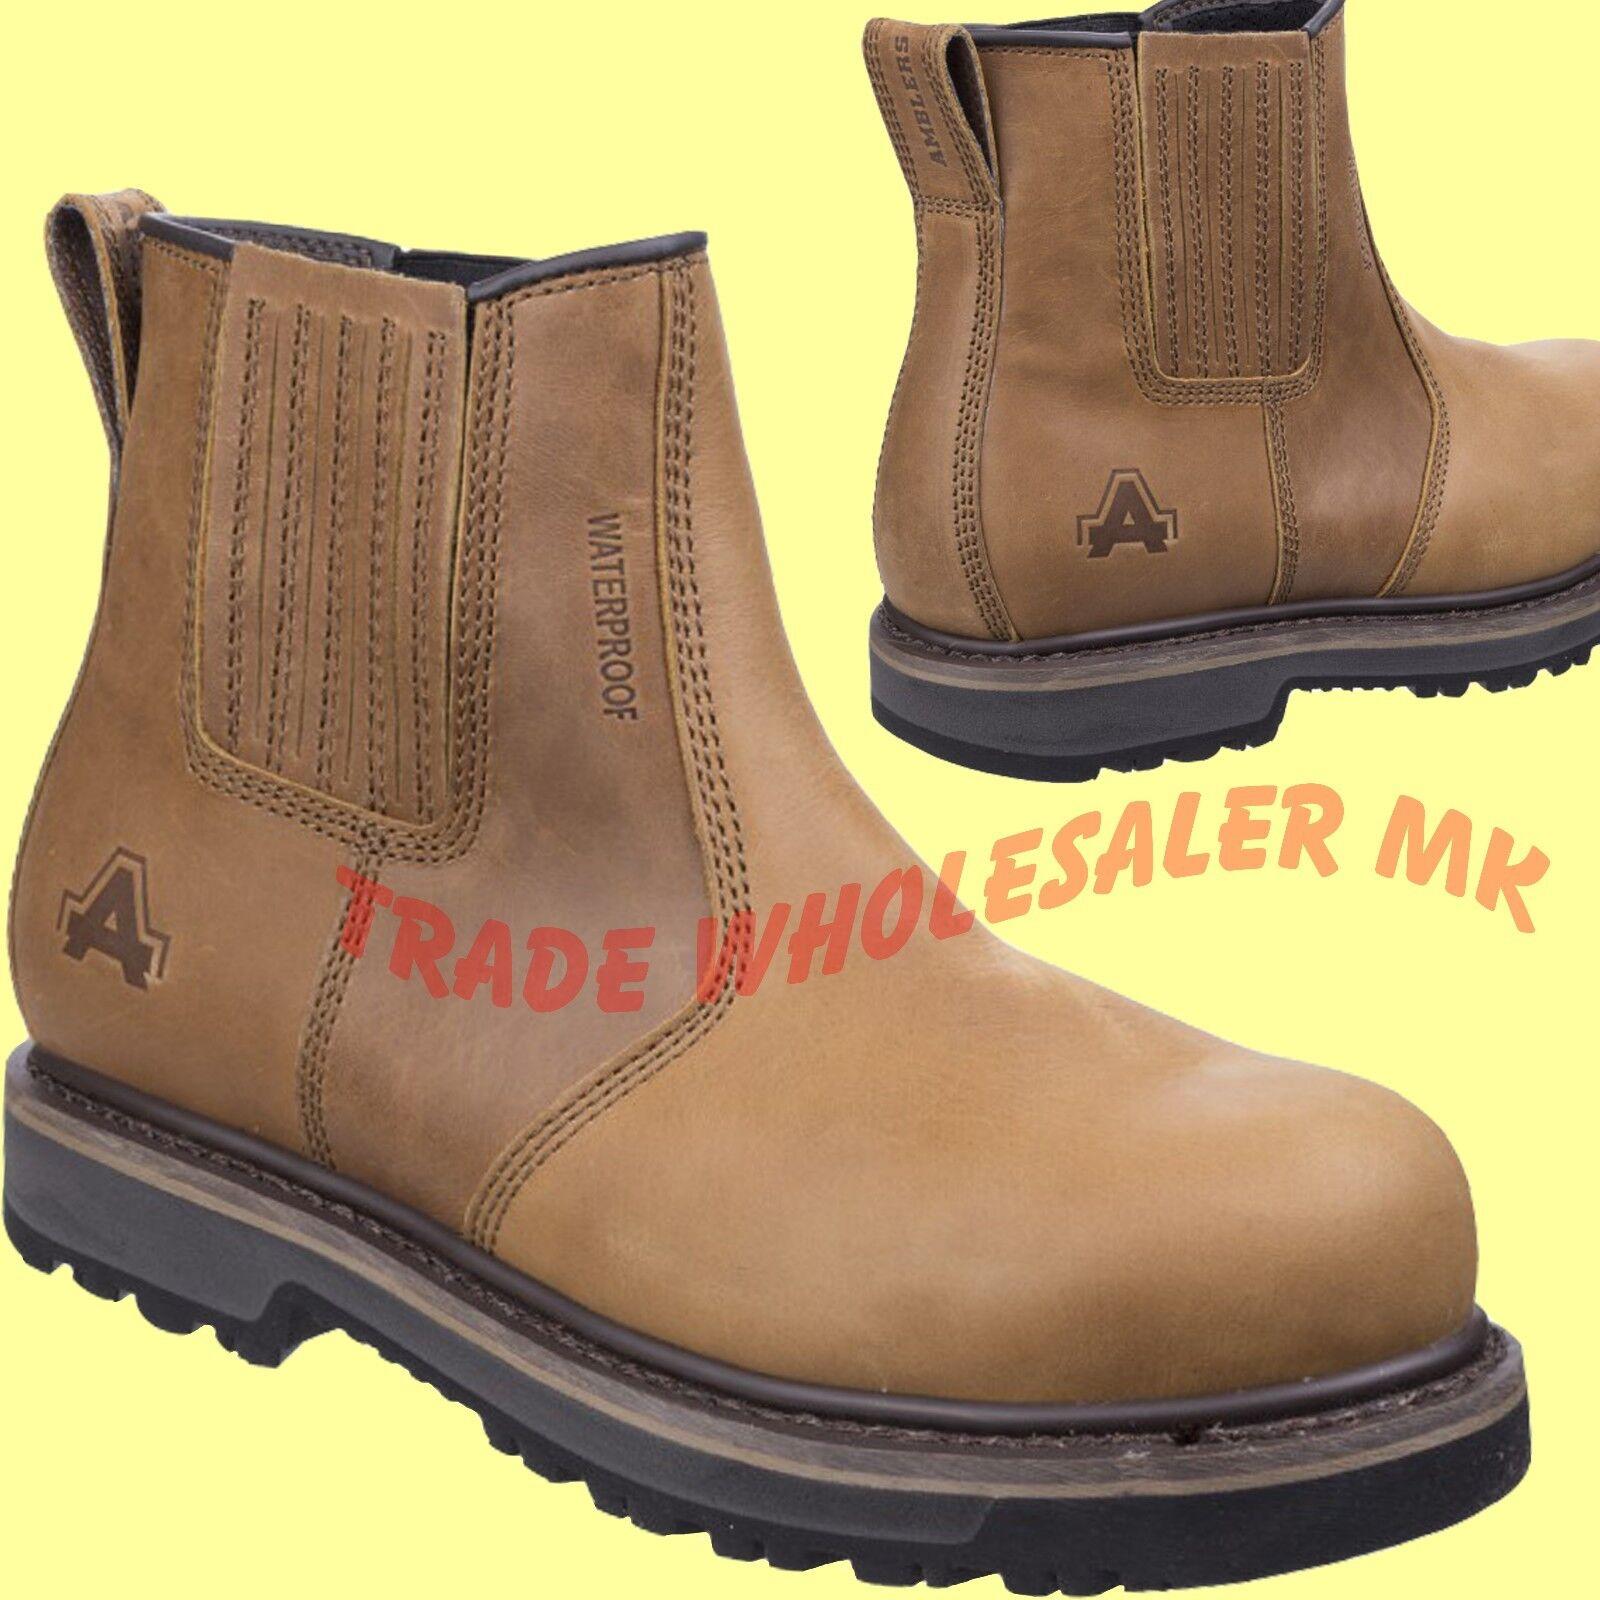 AMBLERS DEALER WORTON CHELSEA STEEL TOE CAP WORTON DEALER SAFETY WORK Stiefel BROWN AS232 90efd3